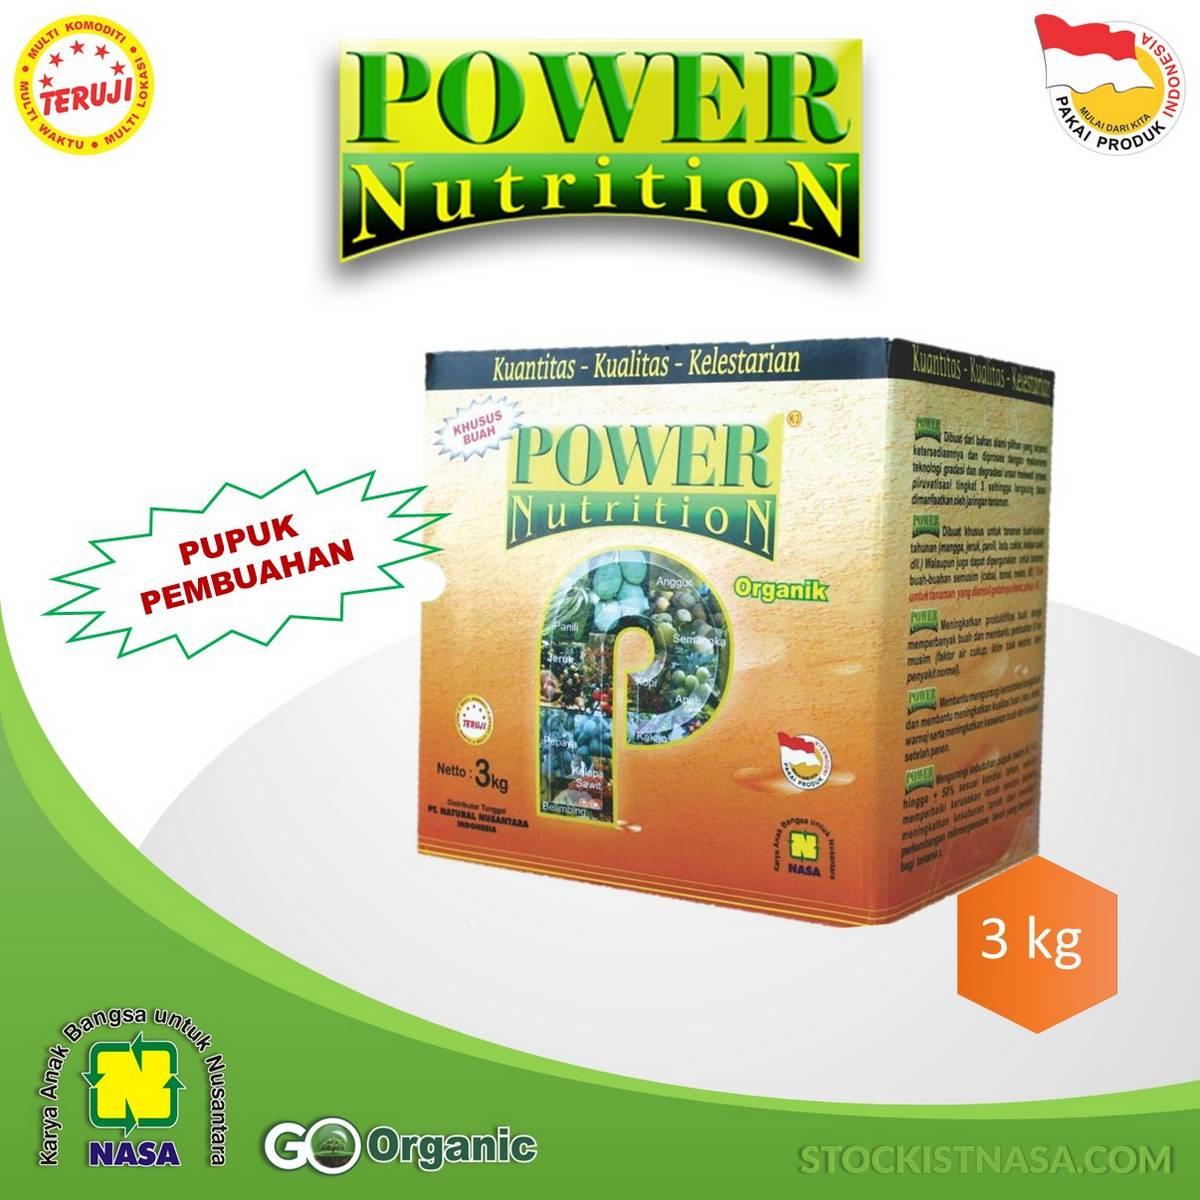 Power Nutrition Kemasan Besar